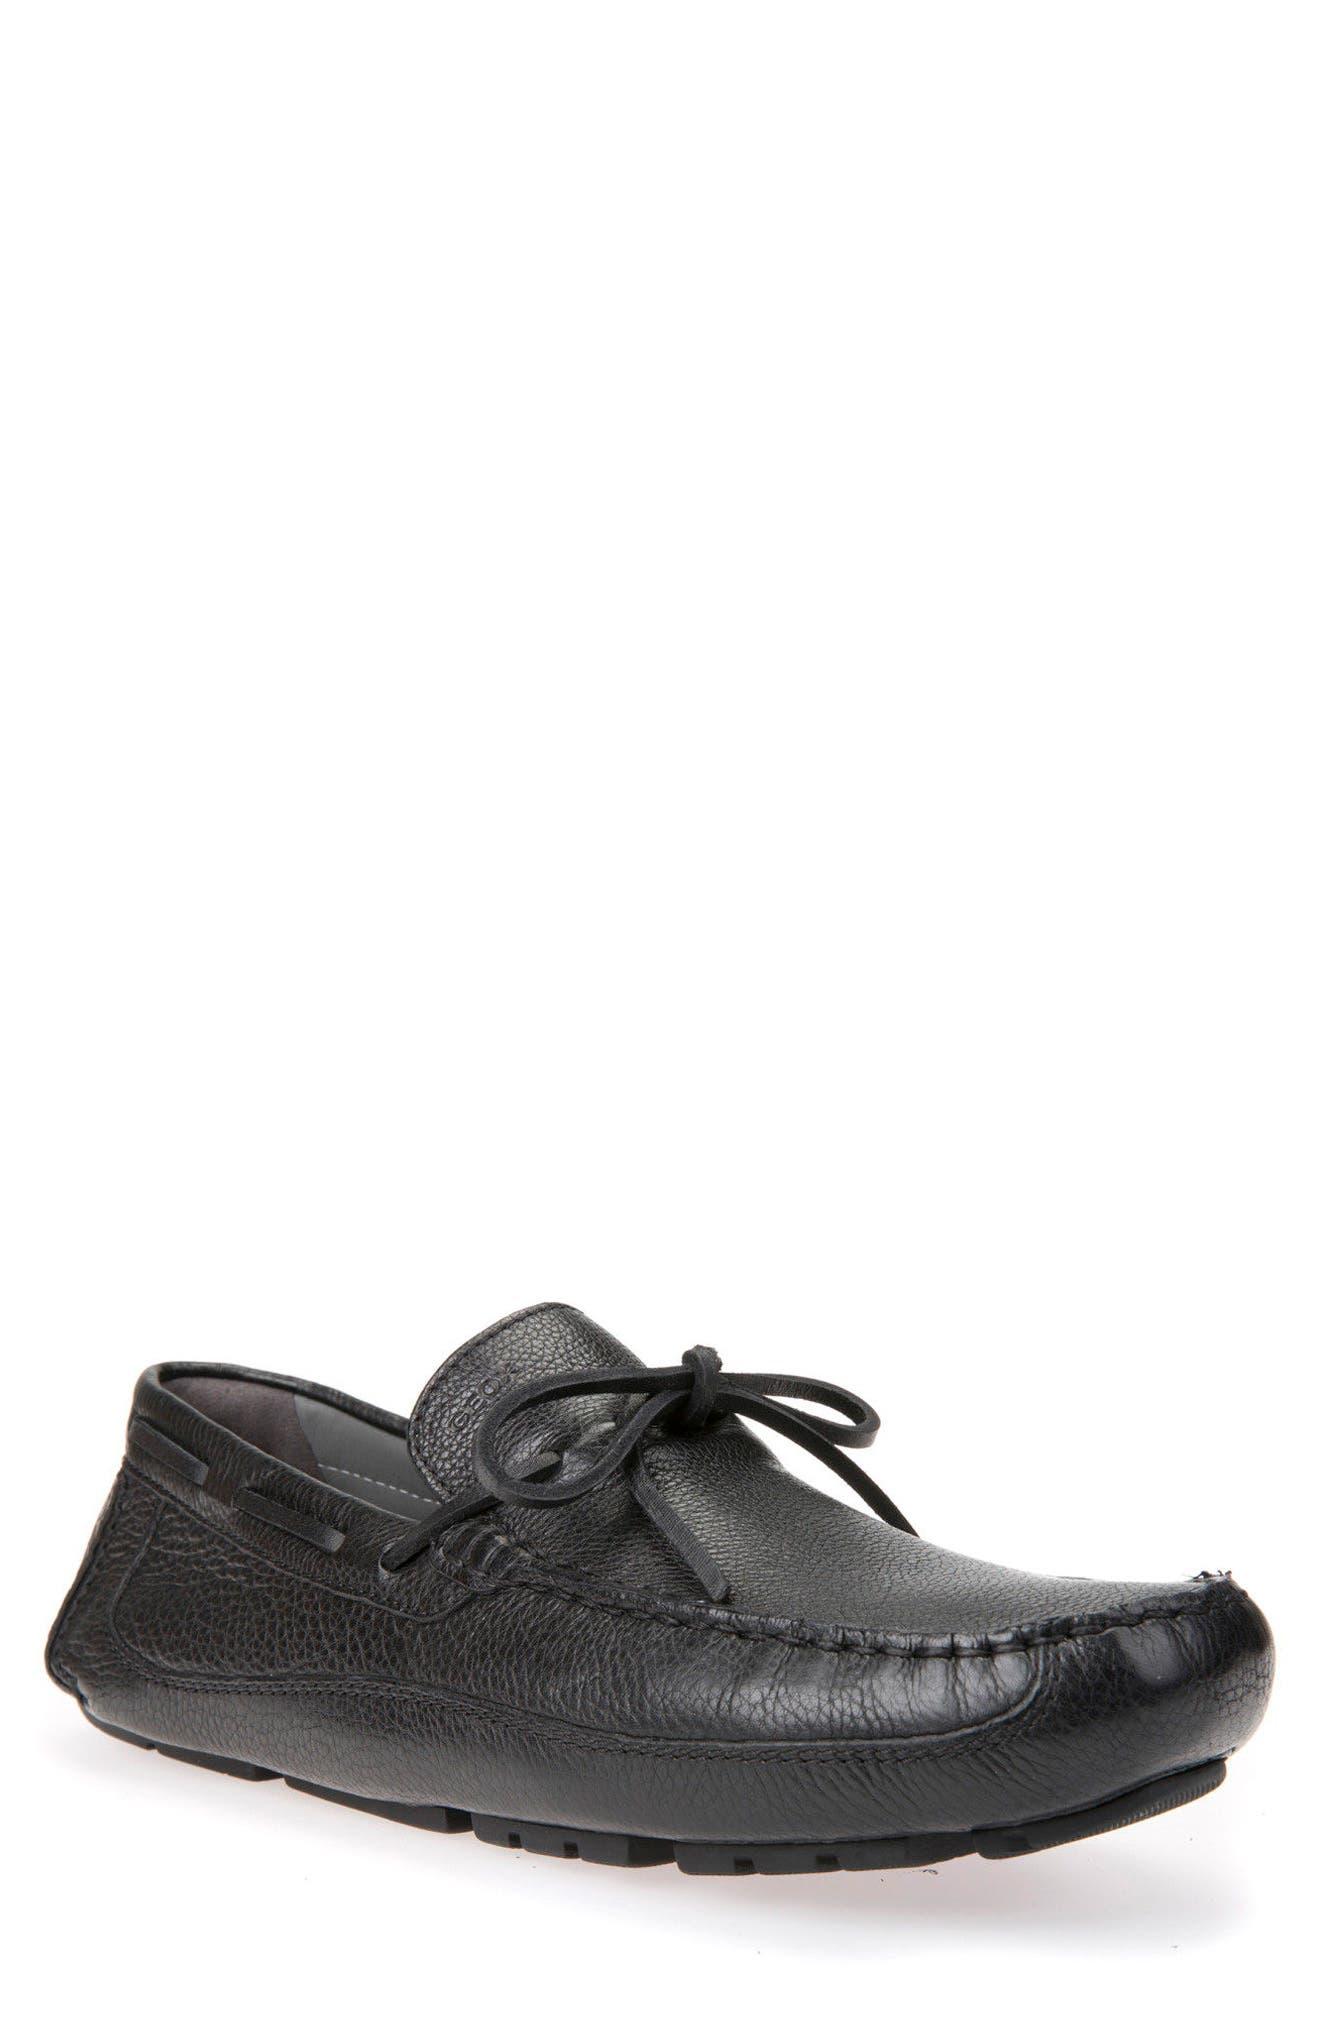 Geox Melbourne 5 Driving Shoe (Men)